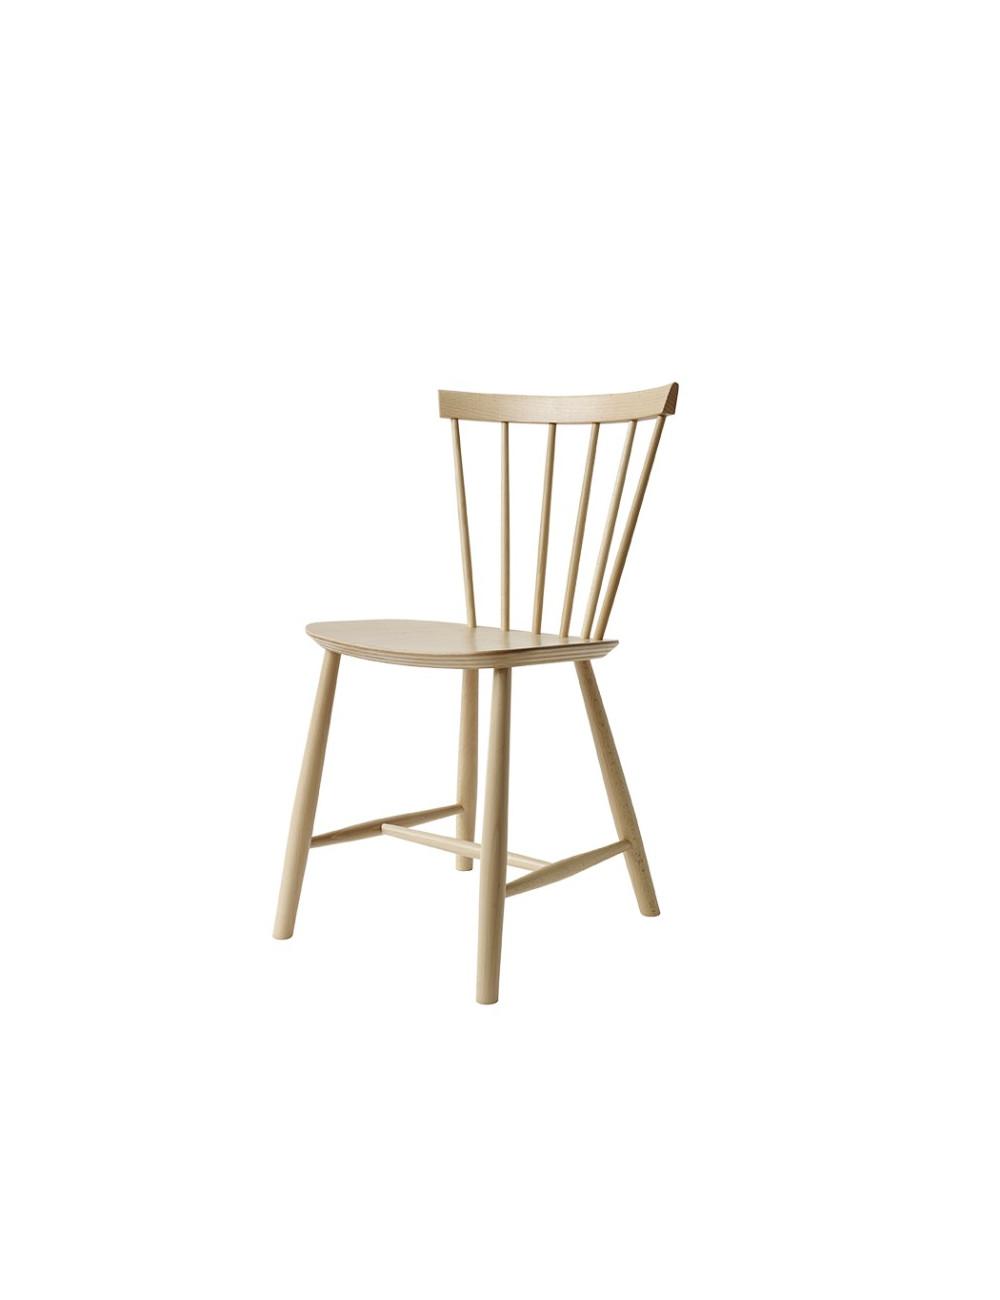 chaise j46 hetre fbd mobler